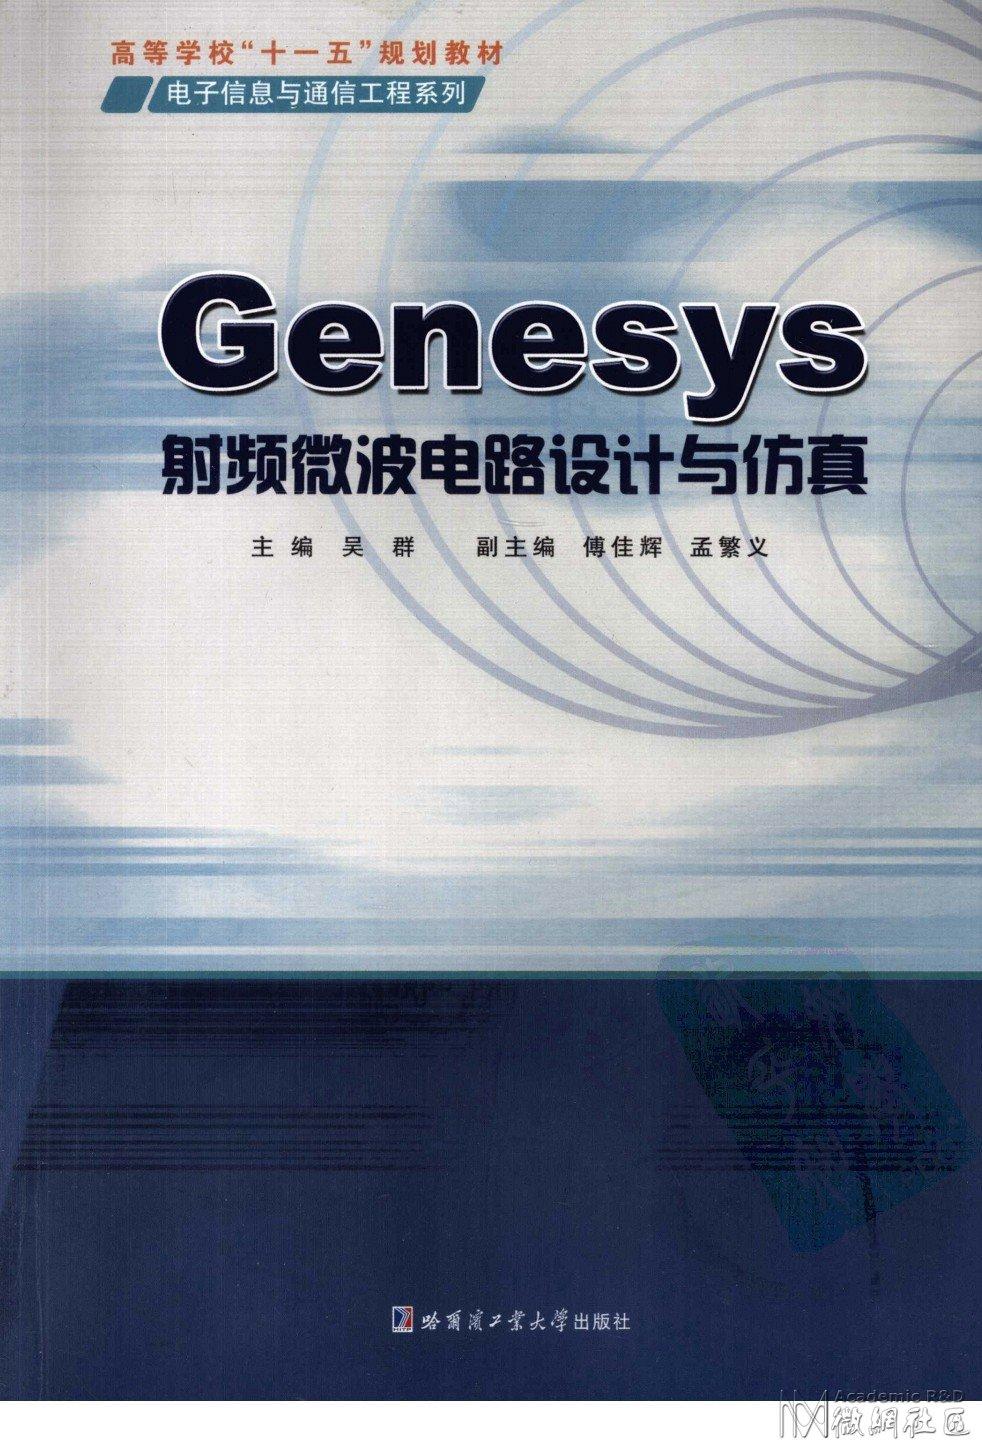 genesys射频微波电路设计与仿真-吴群